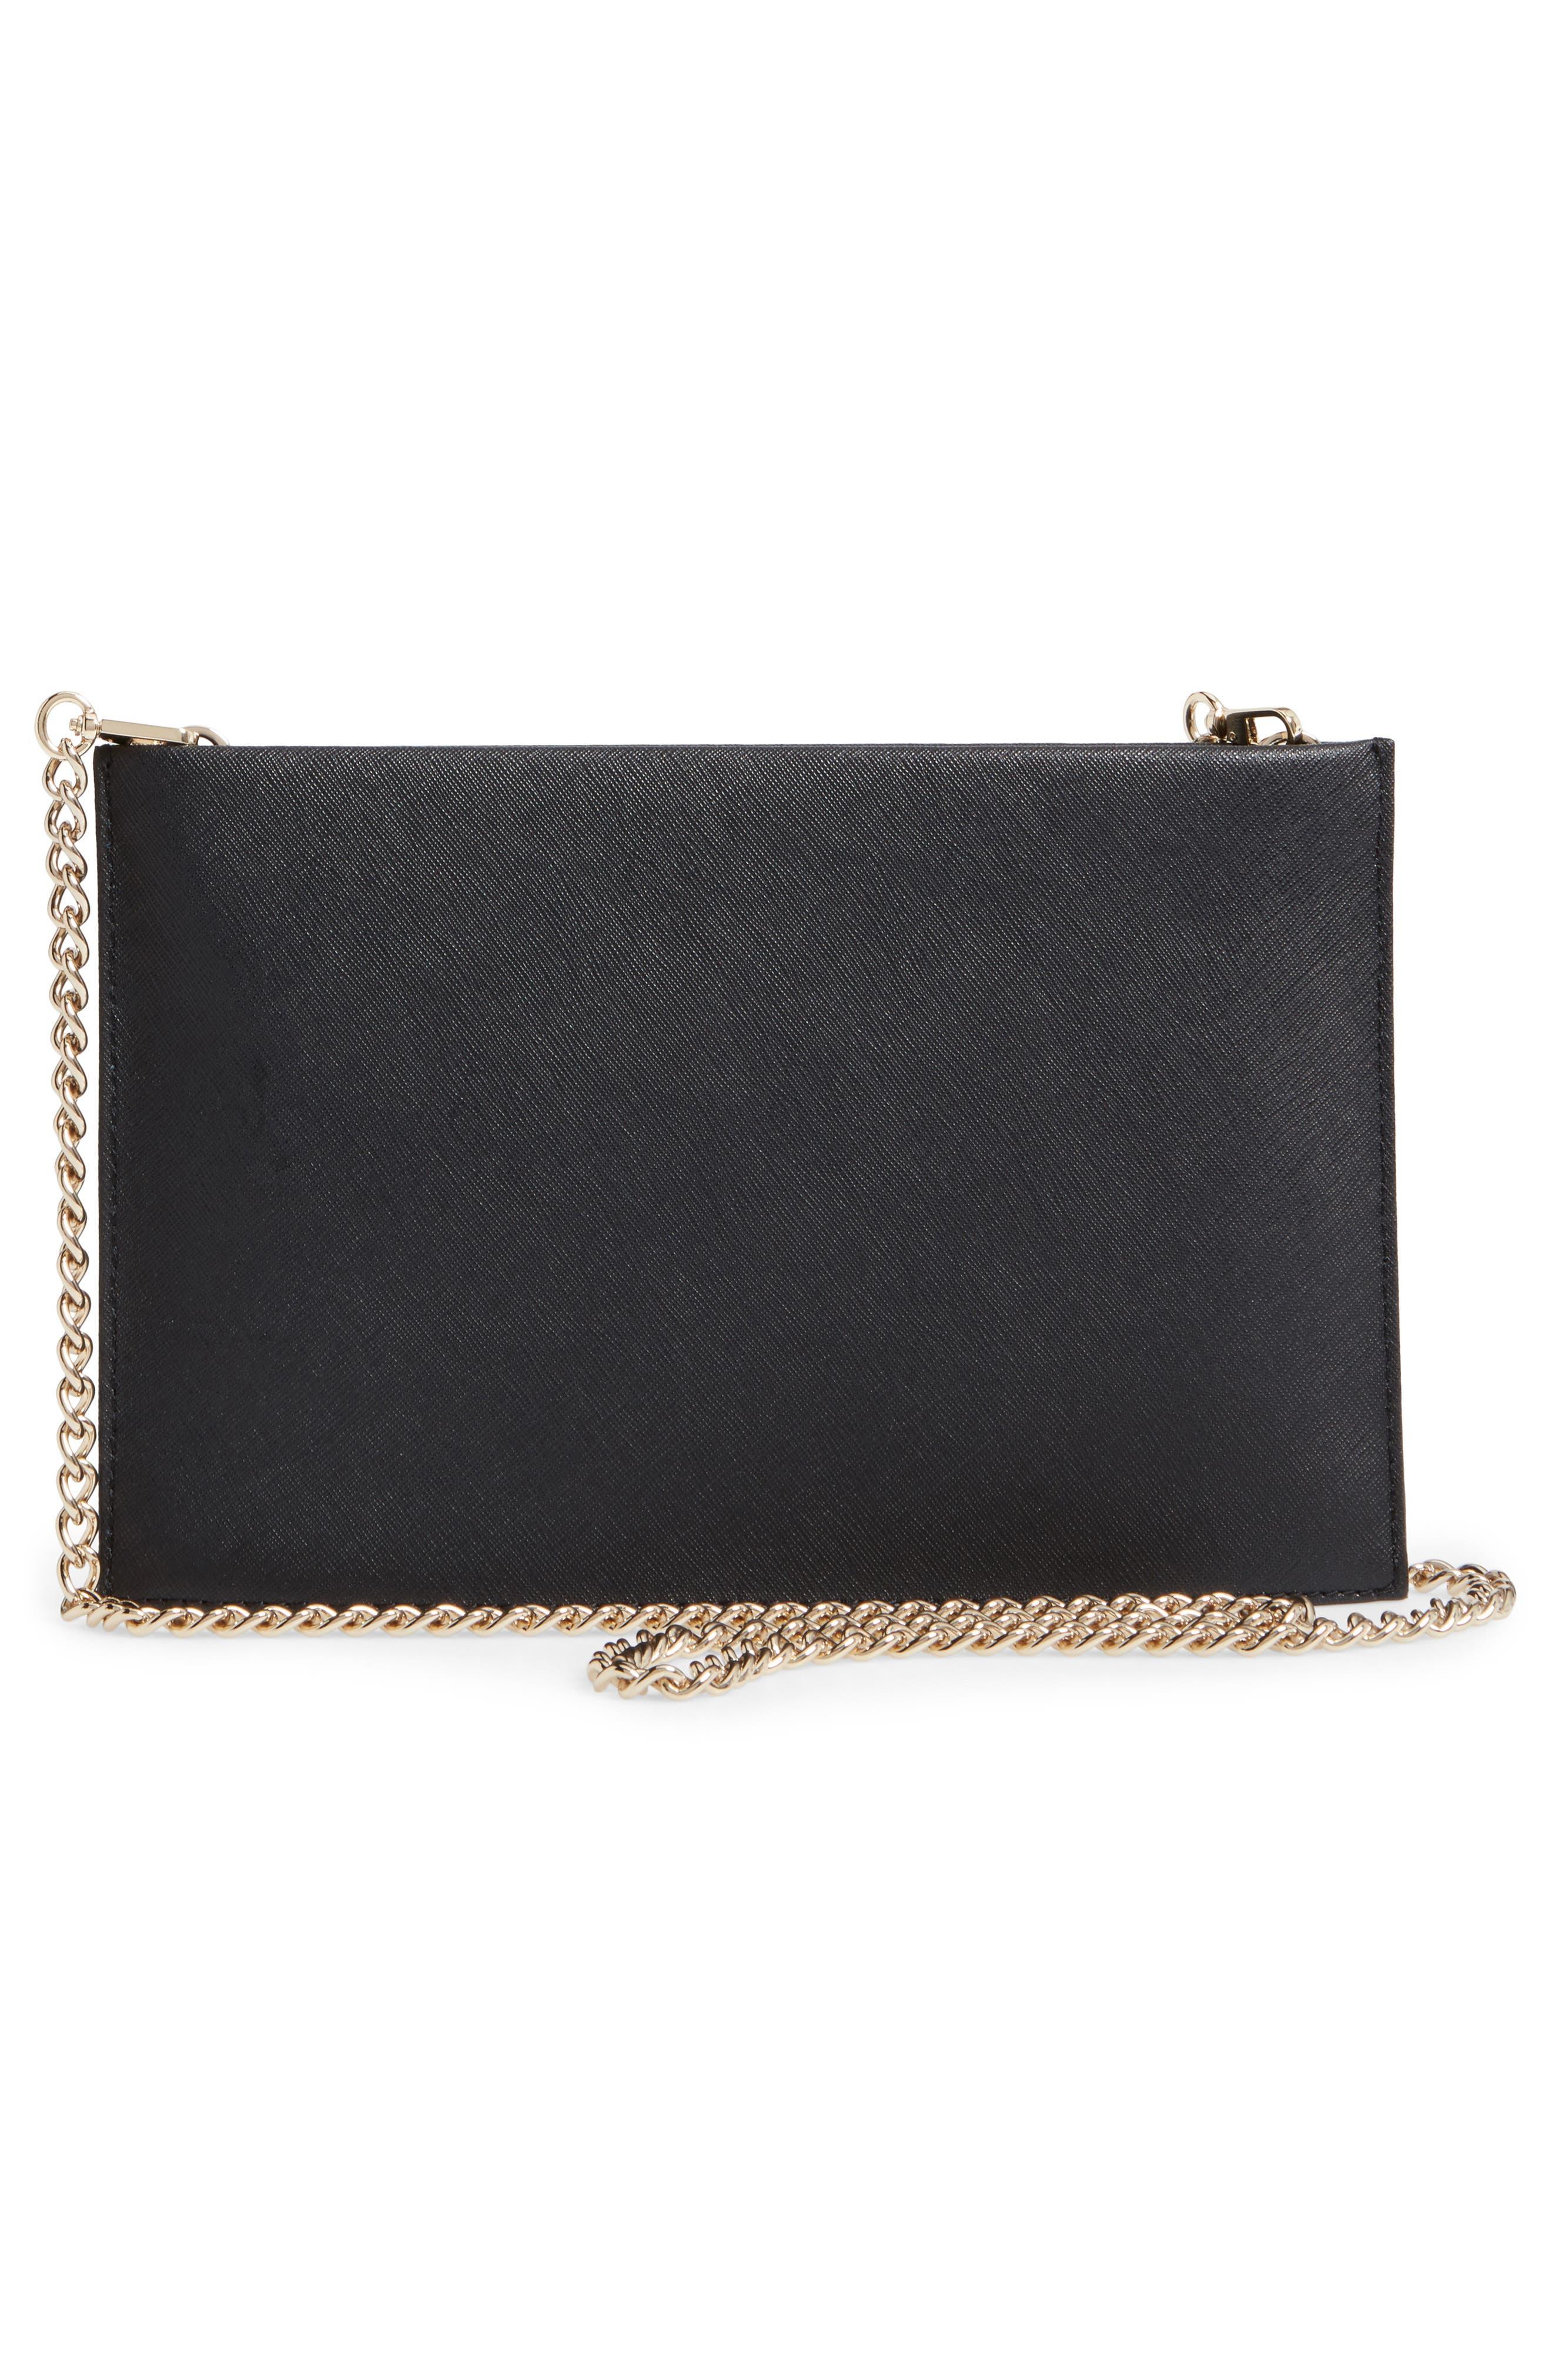 ma cherie - cherries sima leather shoulder bag,                             Alternate thumbnail 3, color,                             001